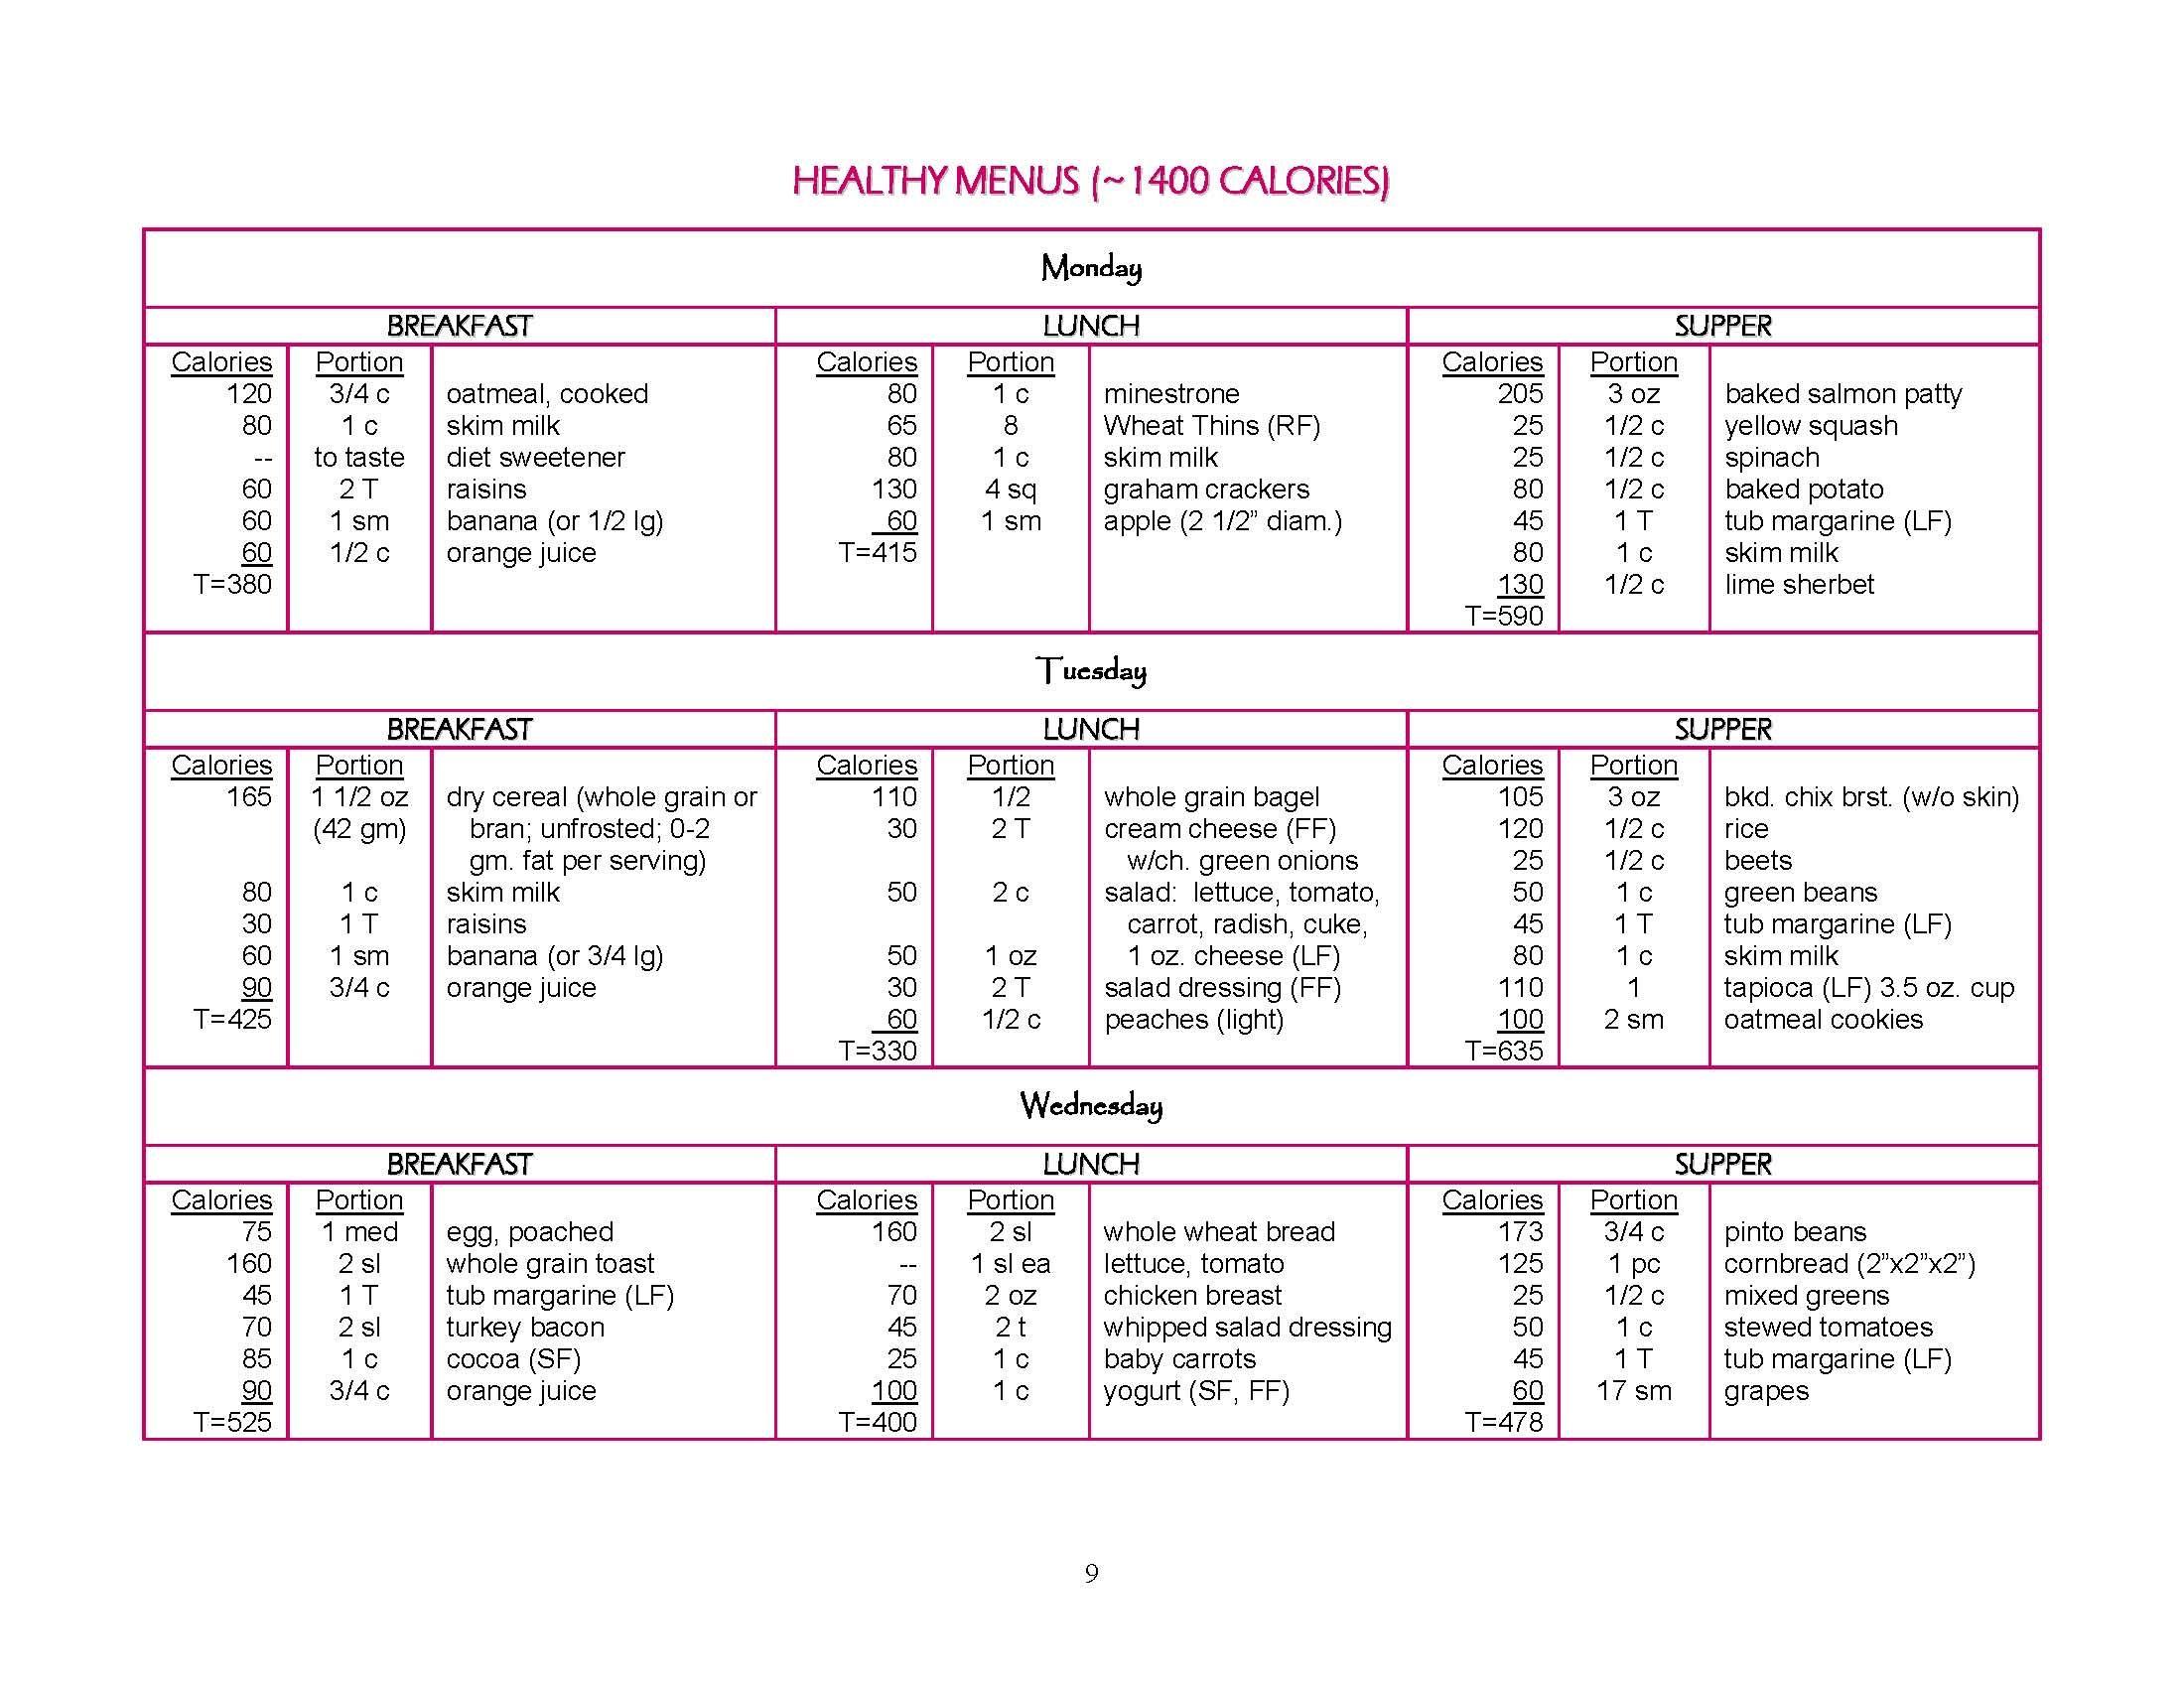 1400 calorie sample meal plan from louisville metro dept of public health  u0026 wellness